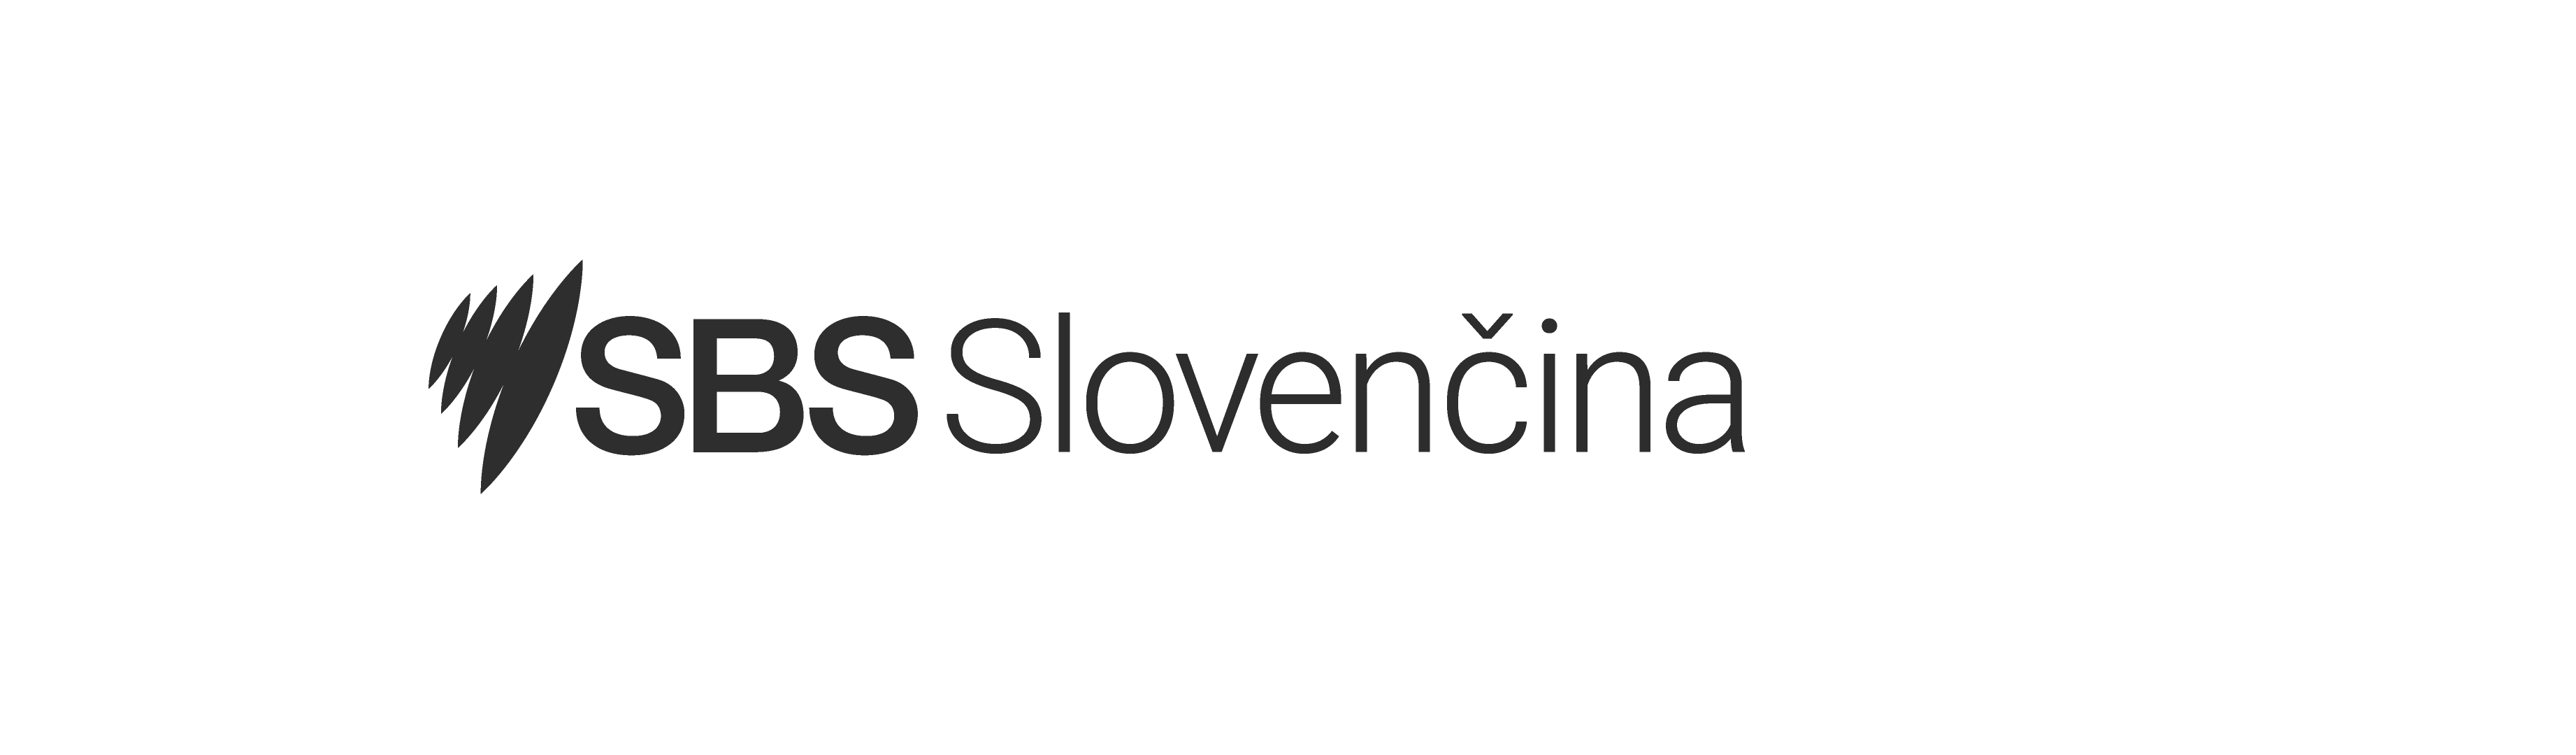 SBS Slovak